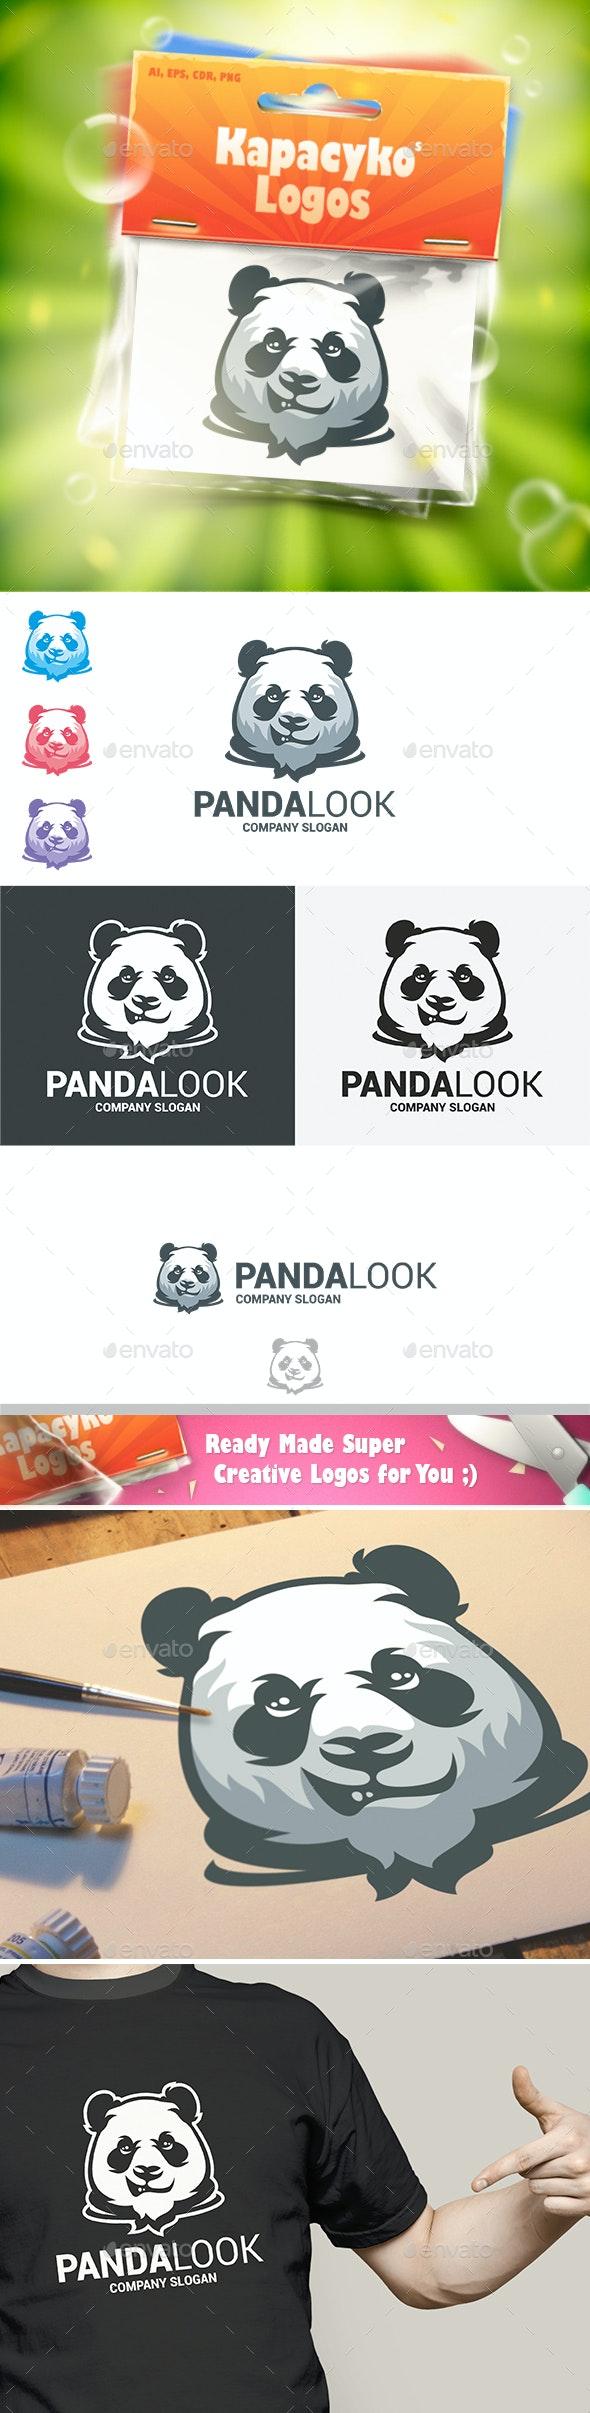 Panda Look Logo - Animals Logo Templates